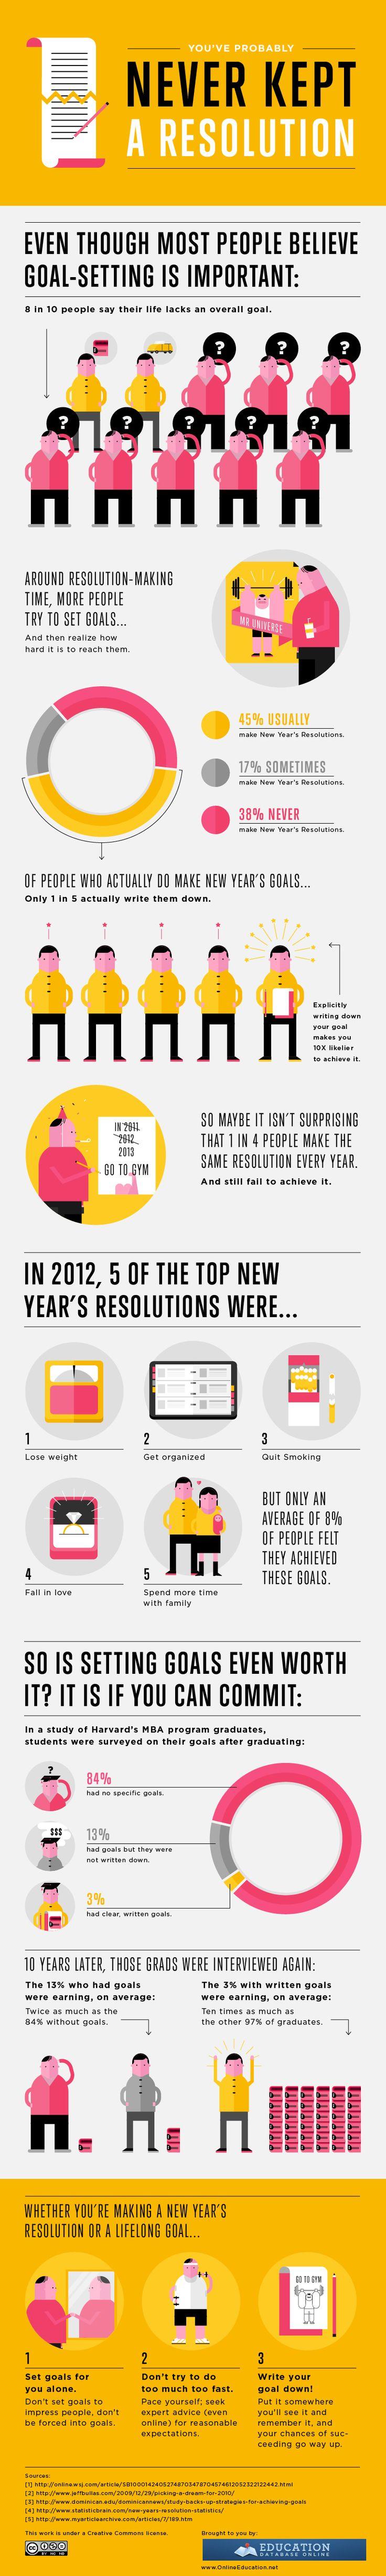 Unique Infographic Design, You've Probably Never Kept A Resolution via @sabela2 #Infographic #Design